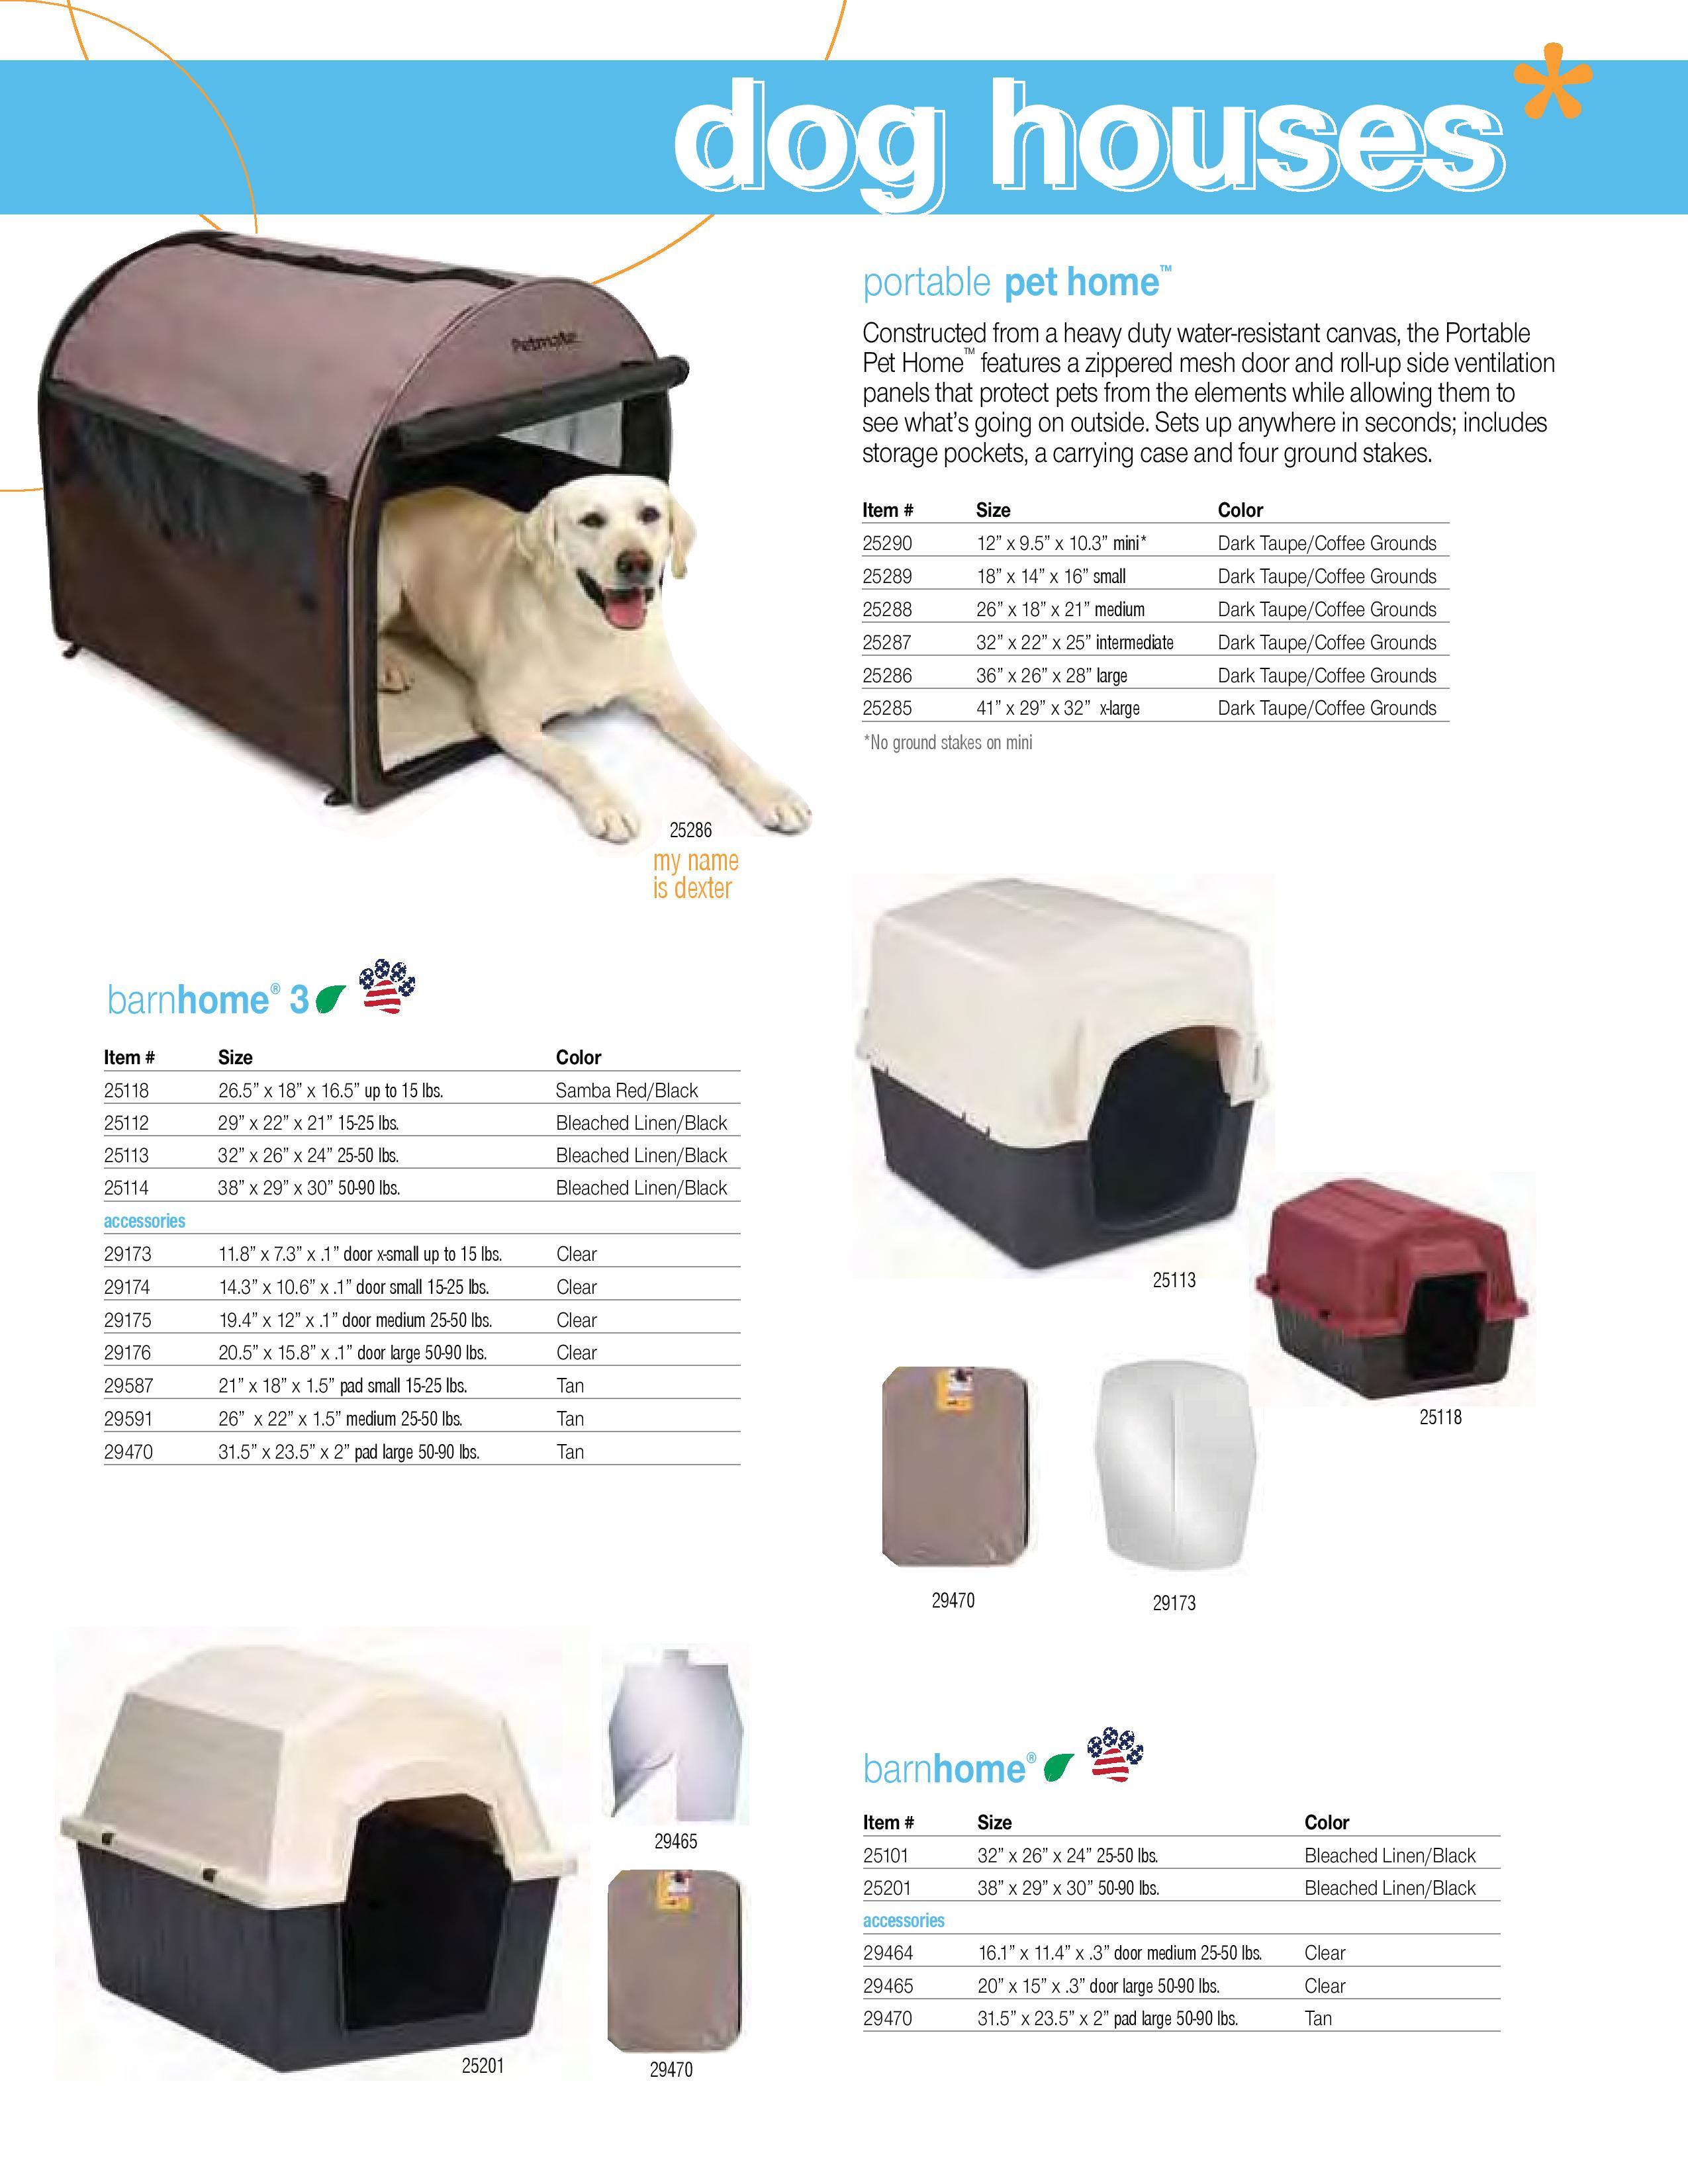 Emirtaes Animals Export 1 (24)